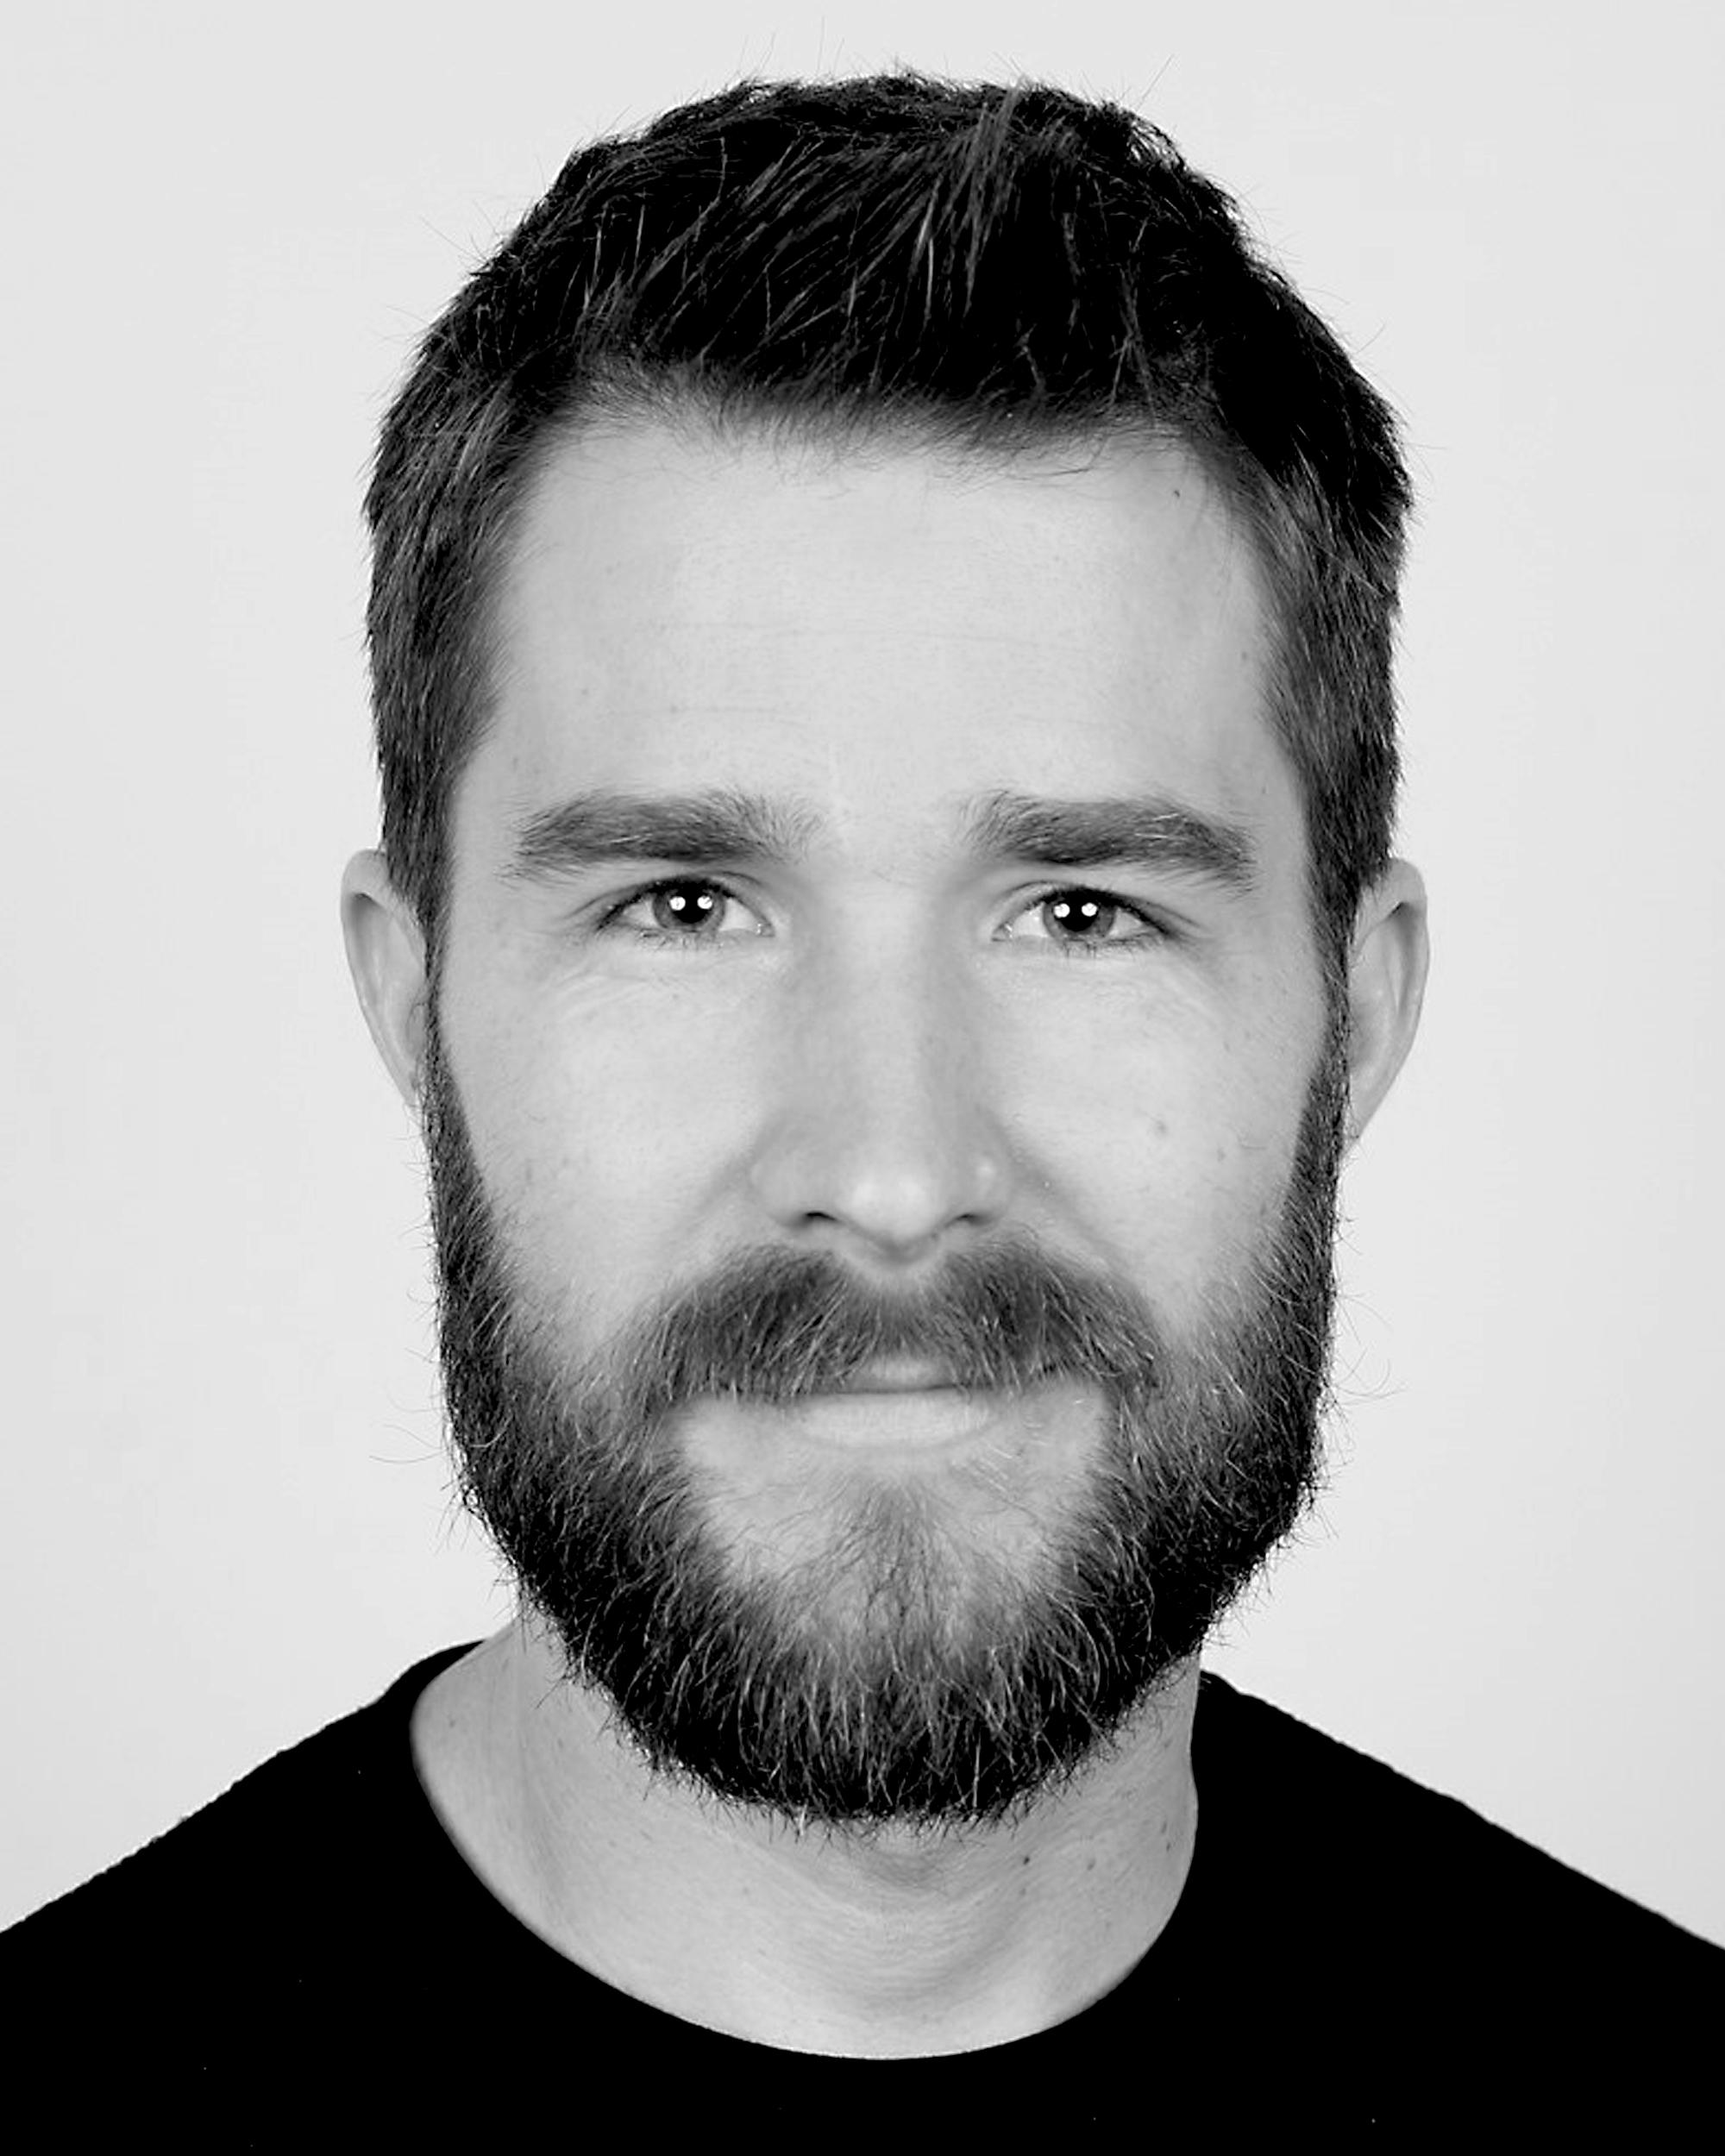 Headshot of Tim O'Brien